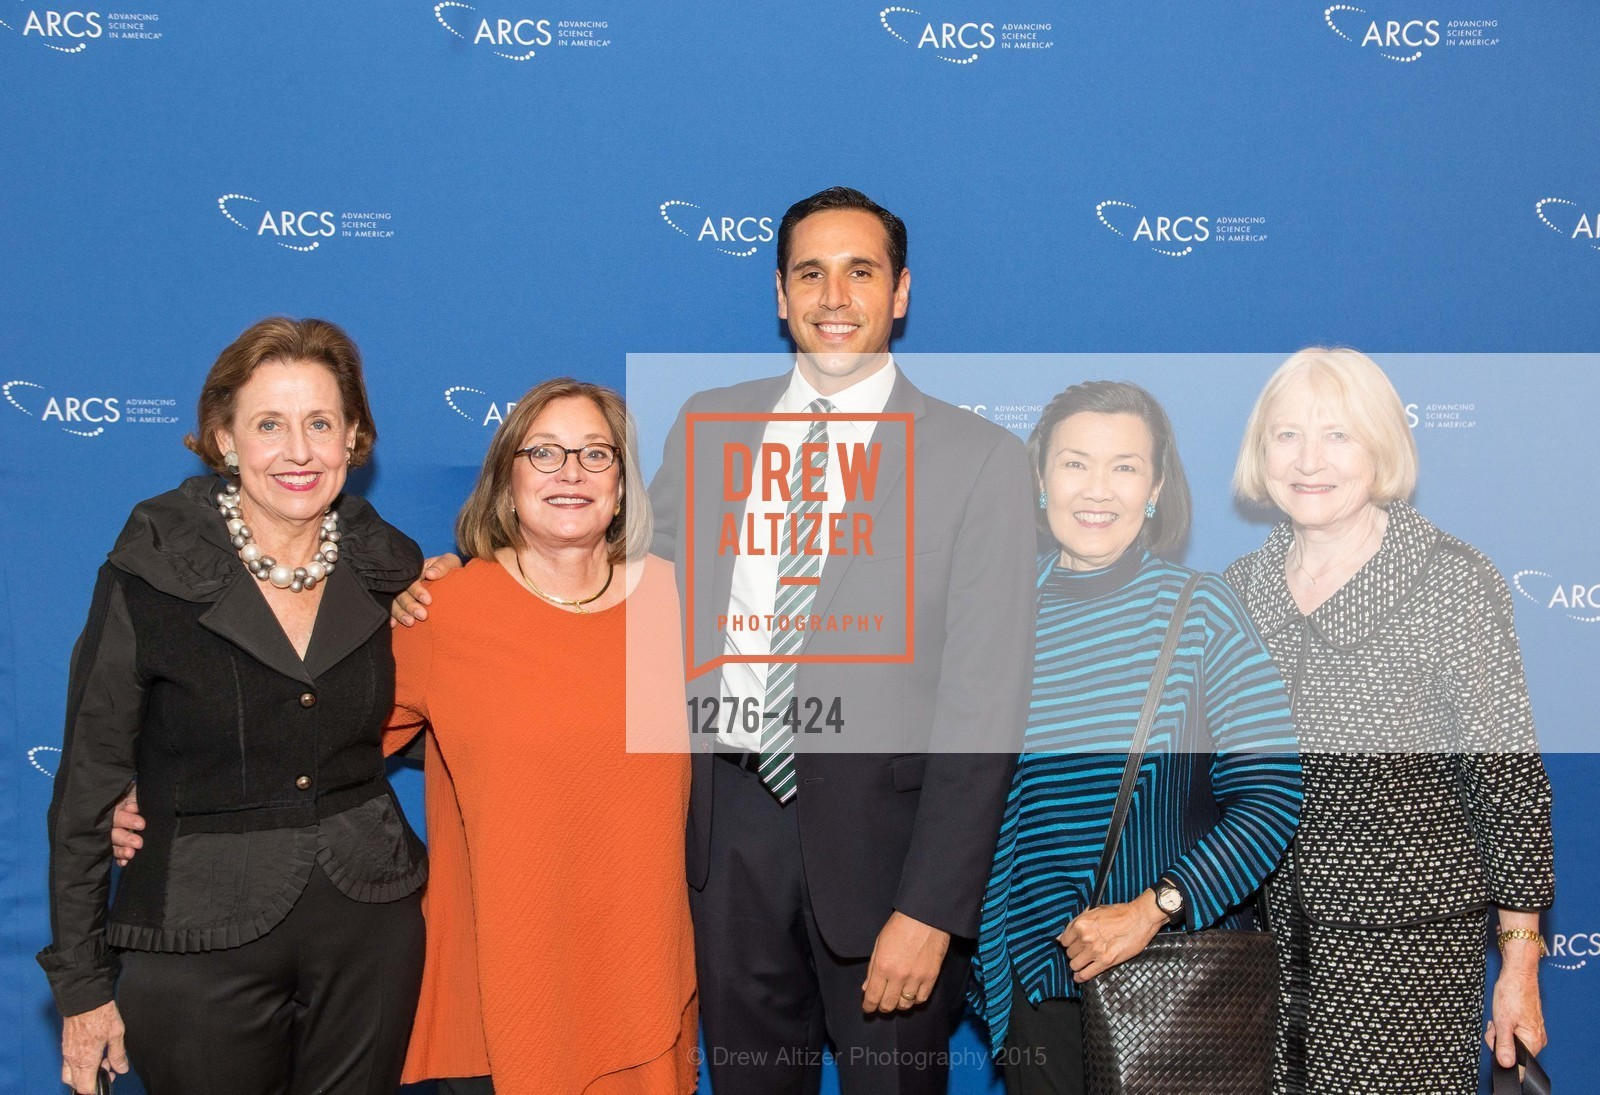 Pam Elliott, Tina Hinckley, Tim Melano, Sharon Woo, Betsy Stafford, 2015 ARCS Foundation Scholar Awards Luncheon, The Fairmont San Francisco. 950 Mason St, October 29th, 2015